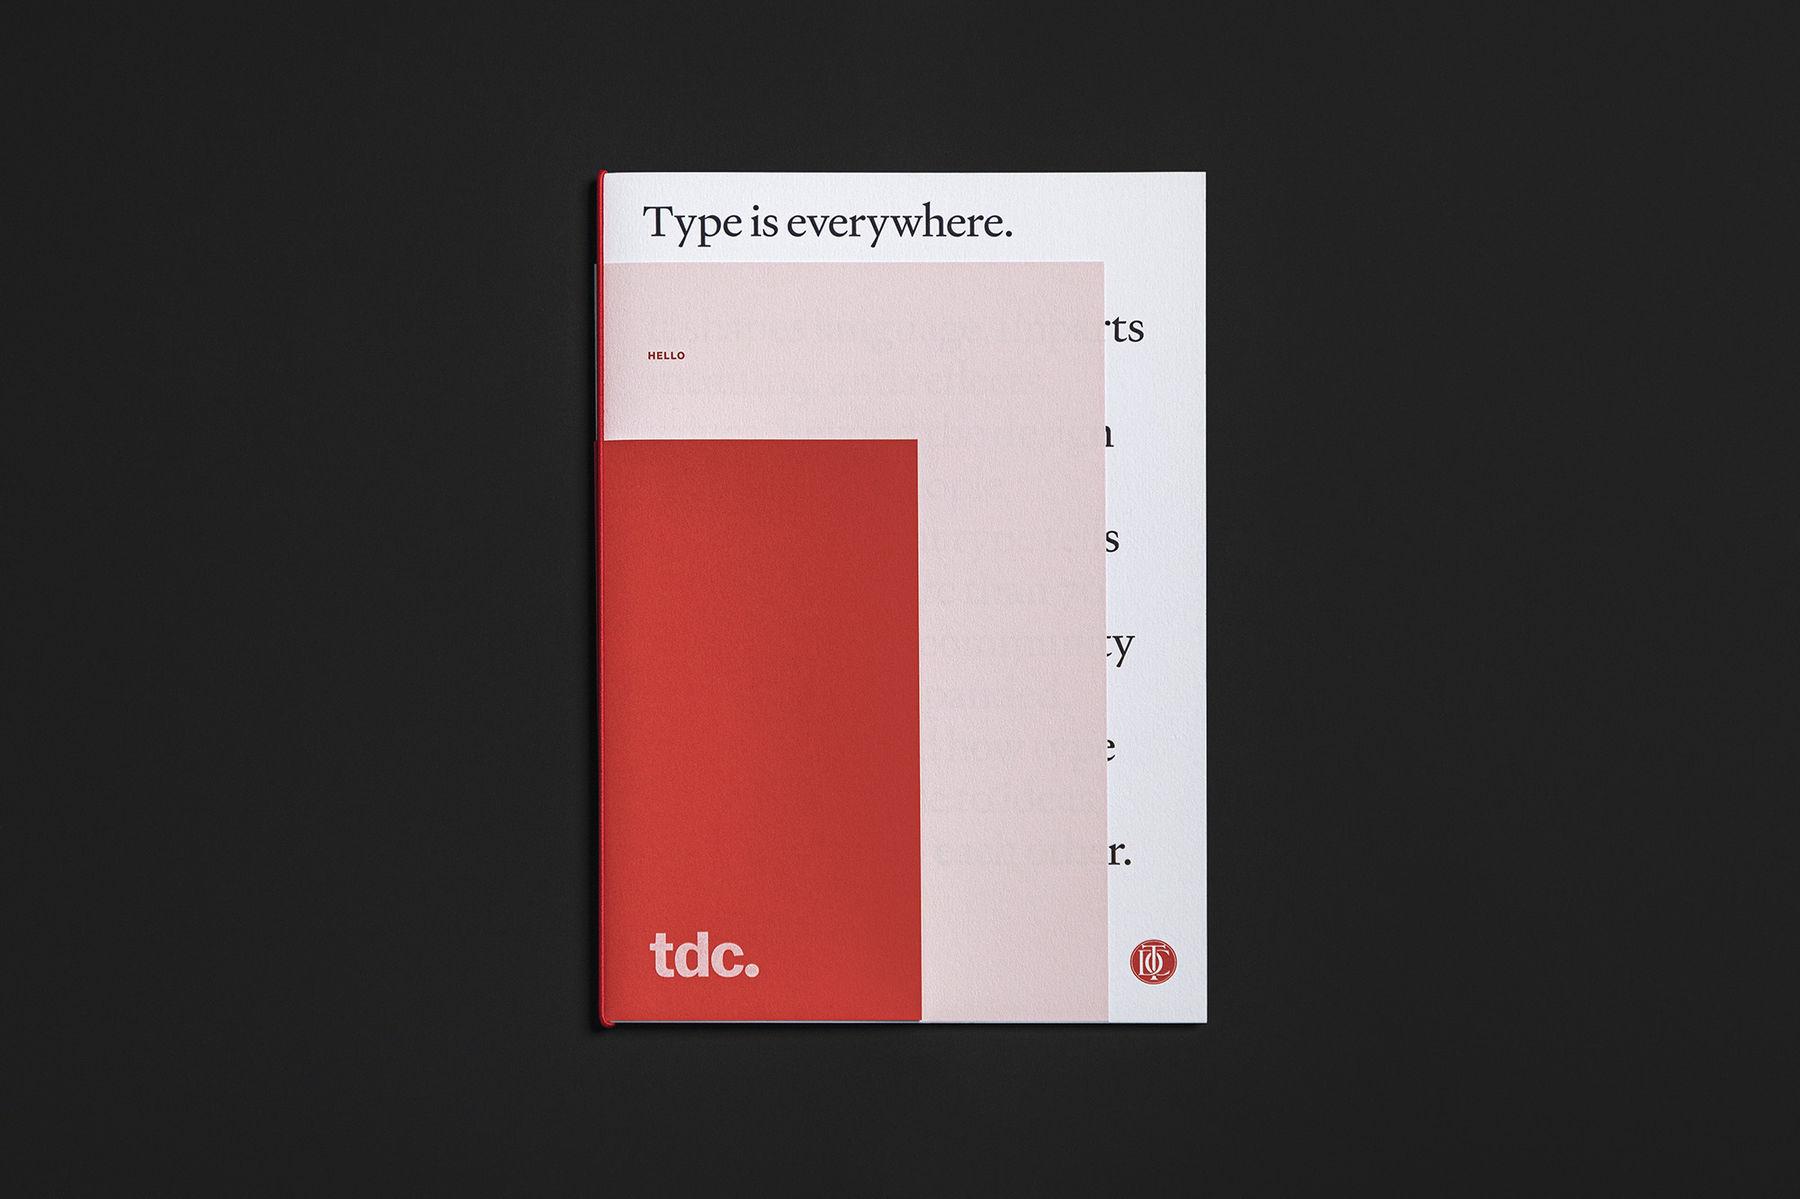 TDC-Booklet-1_dbf8d6a38dd21a4600d81f78eddca413.jpg